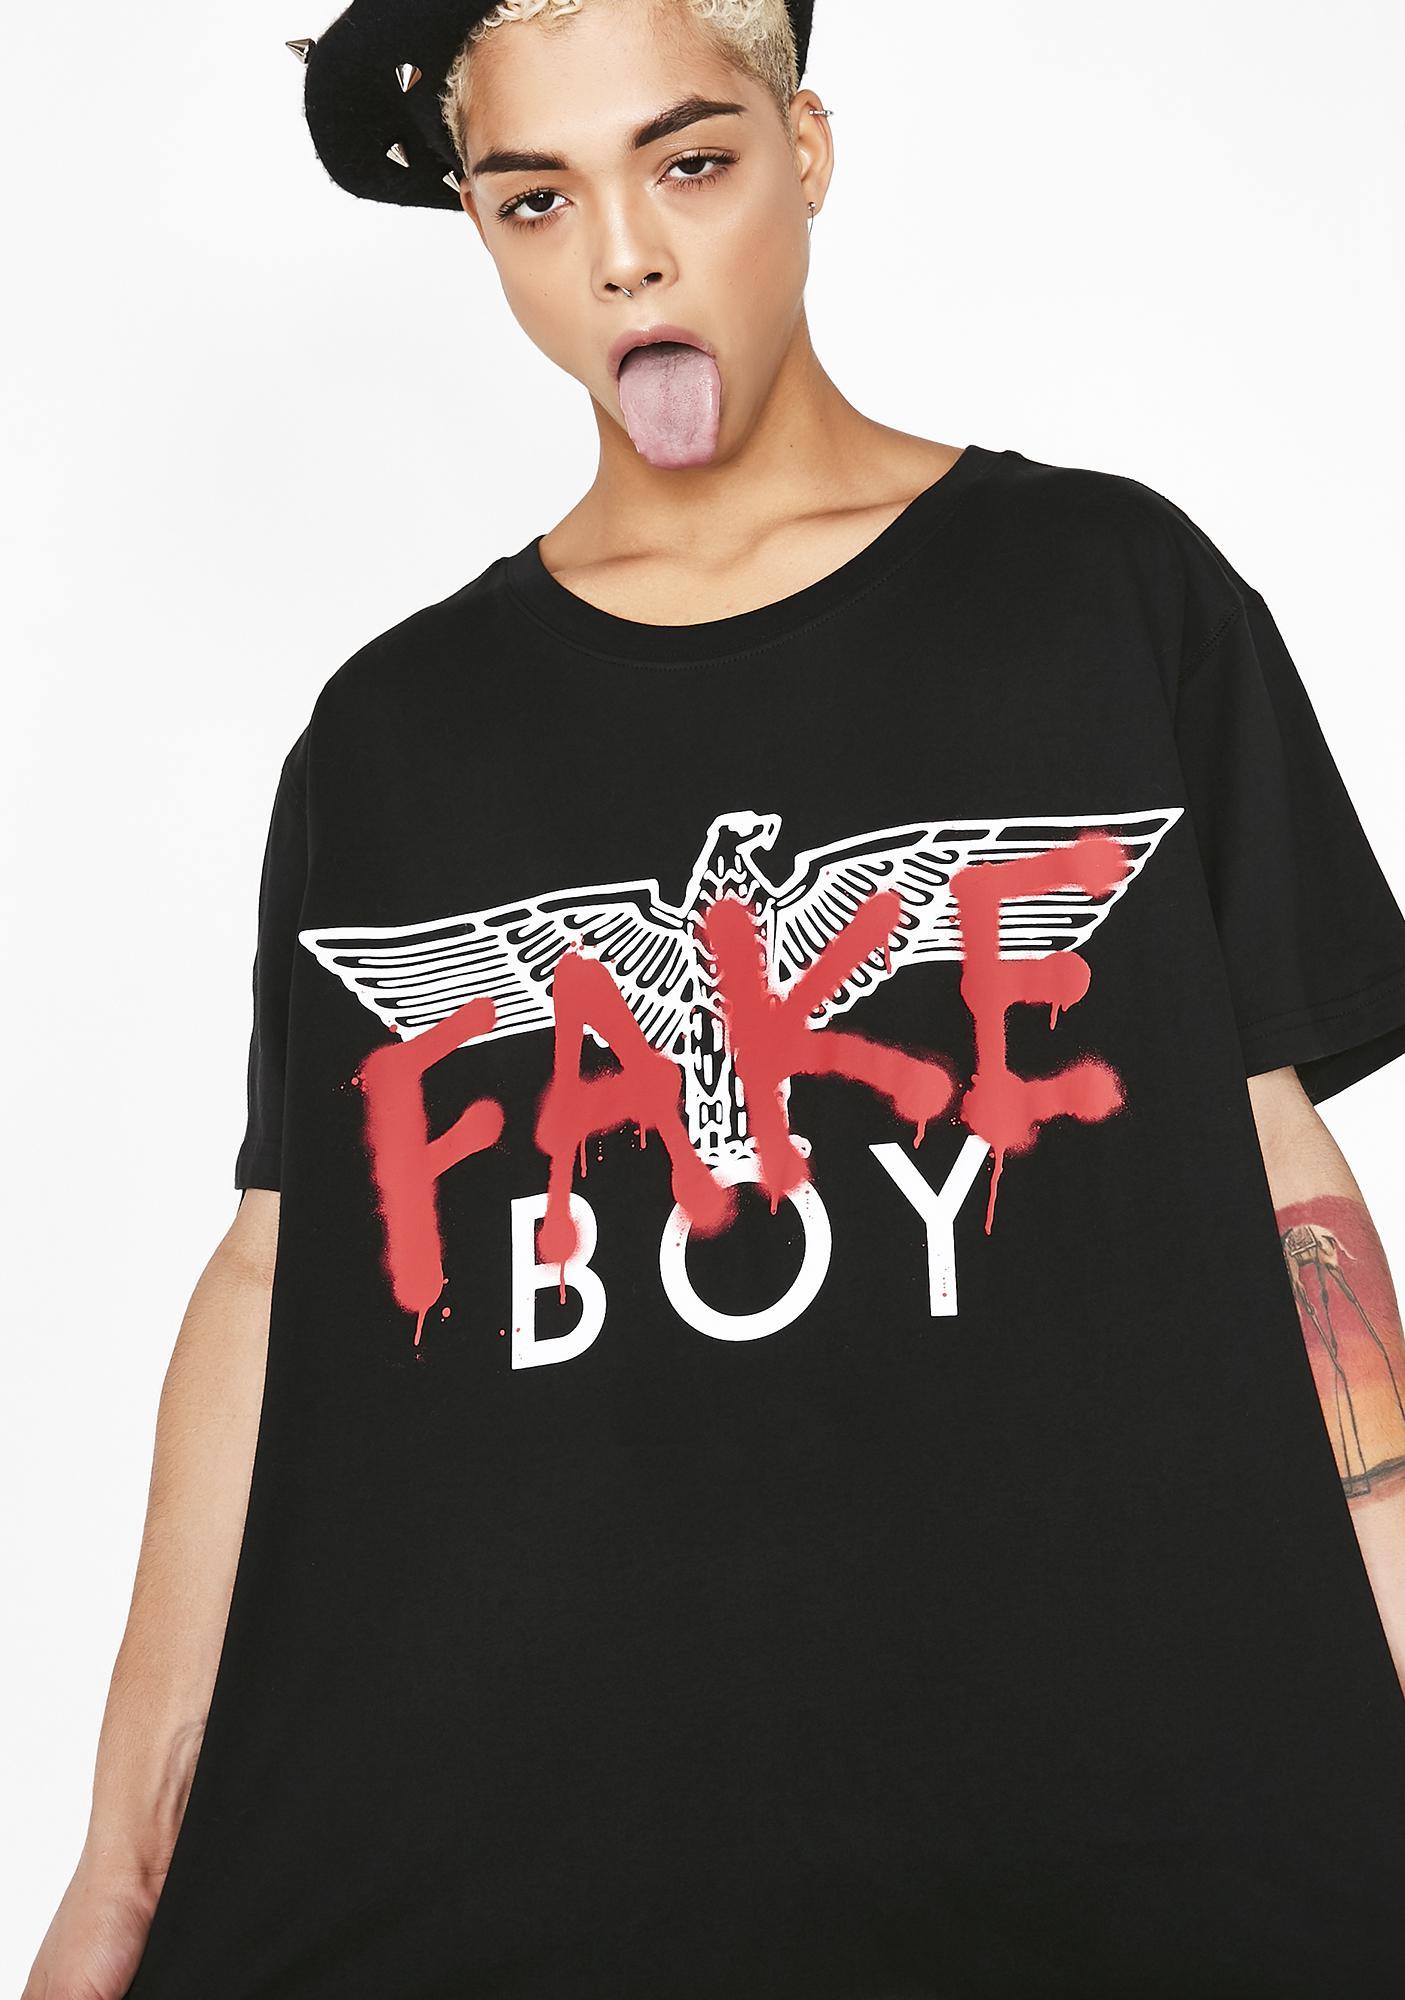 990021339359 BOY London Boy Fake Tee